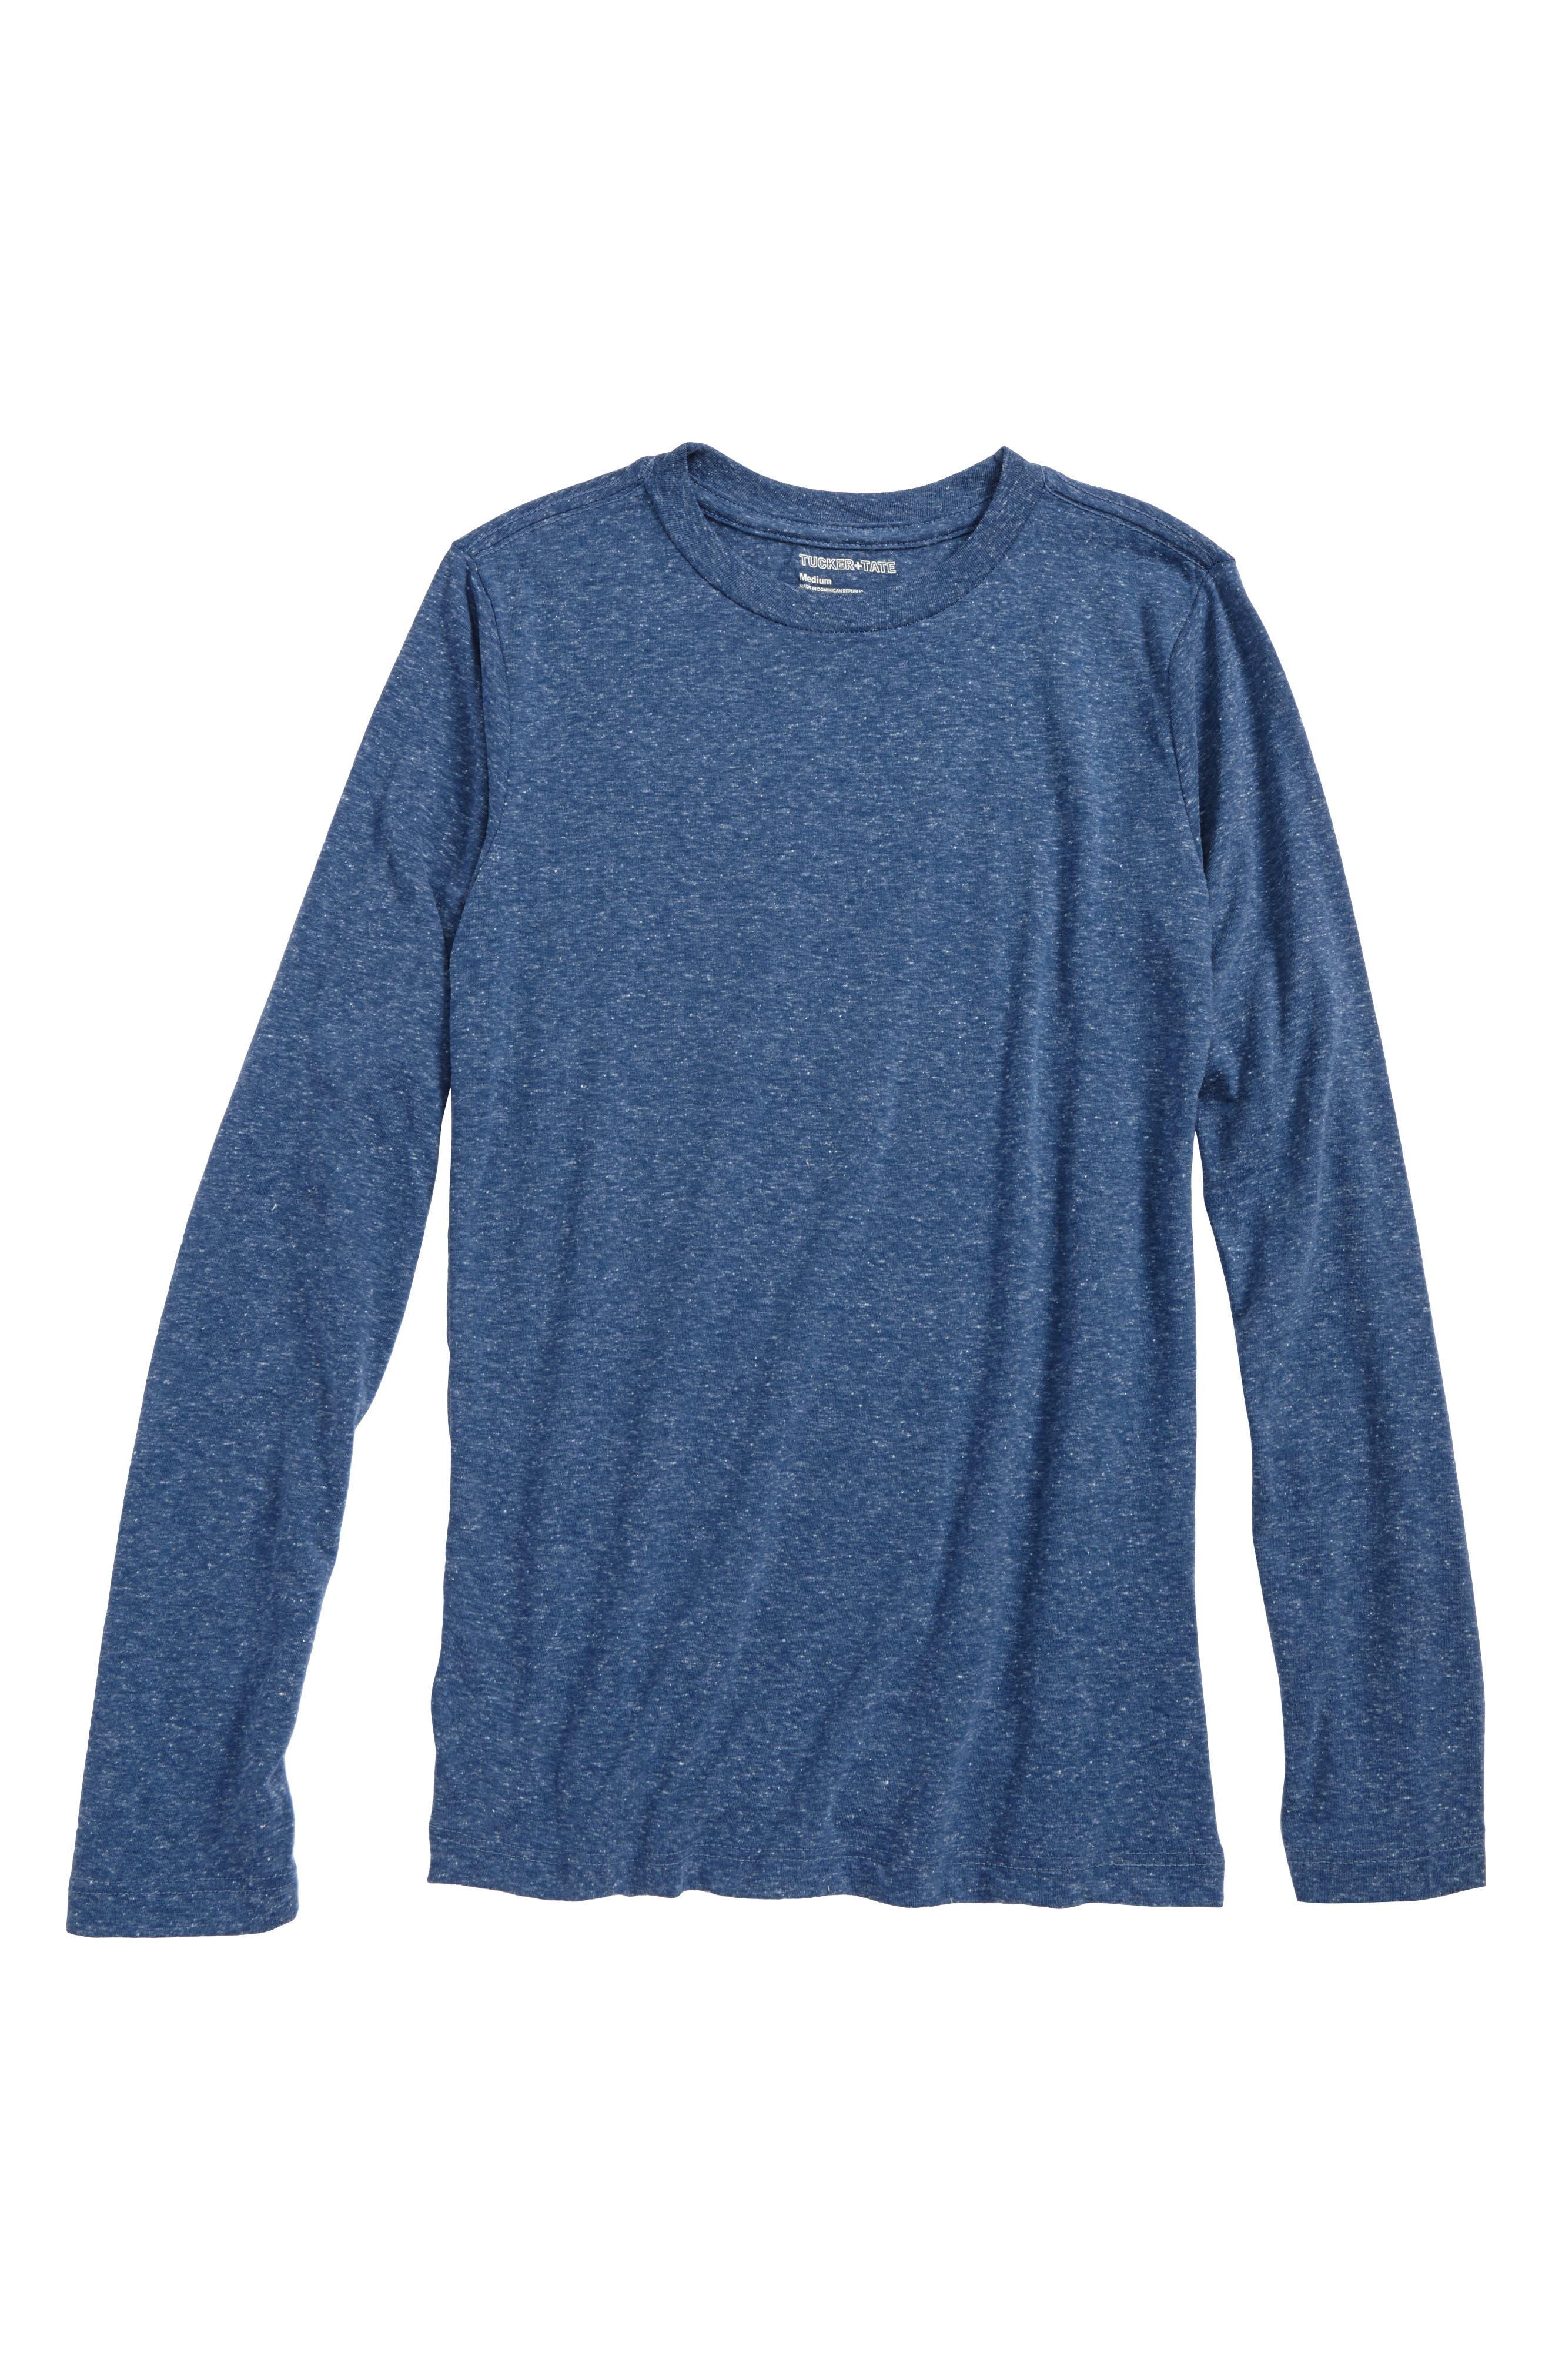 Main Image - Tucker + Tate Basic T-Shirt (Big Boys)